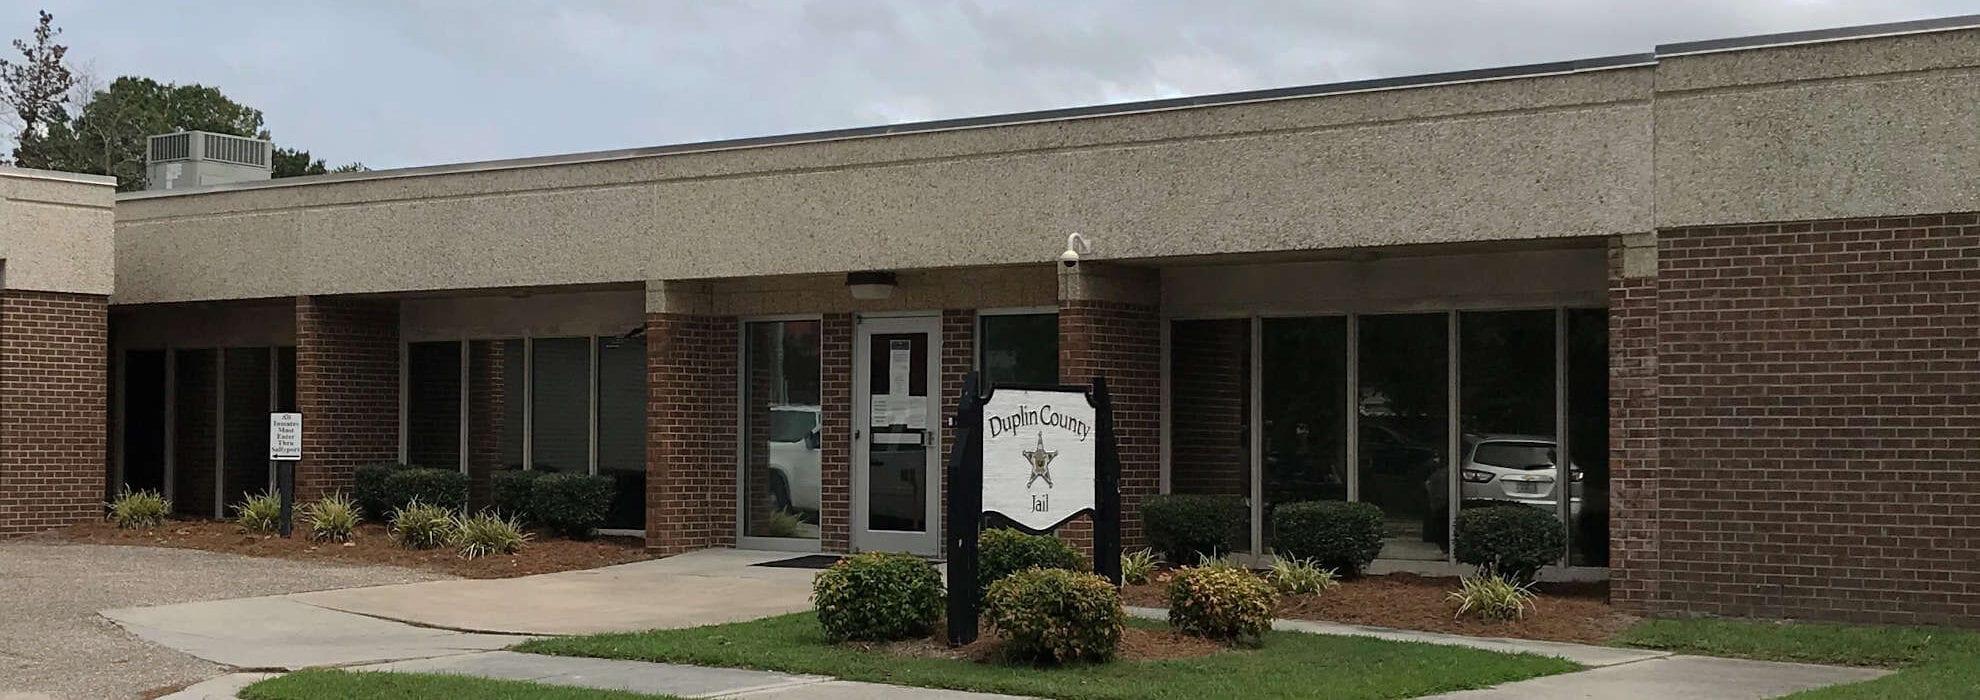 Duplin County Sheriff's Department